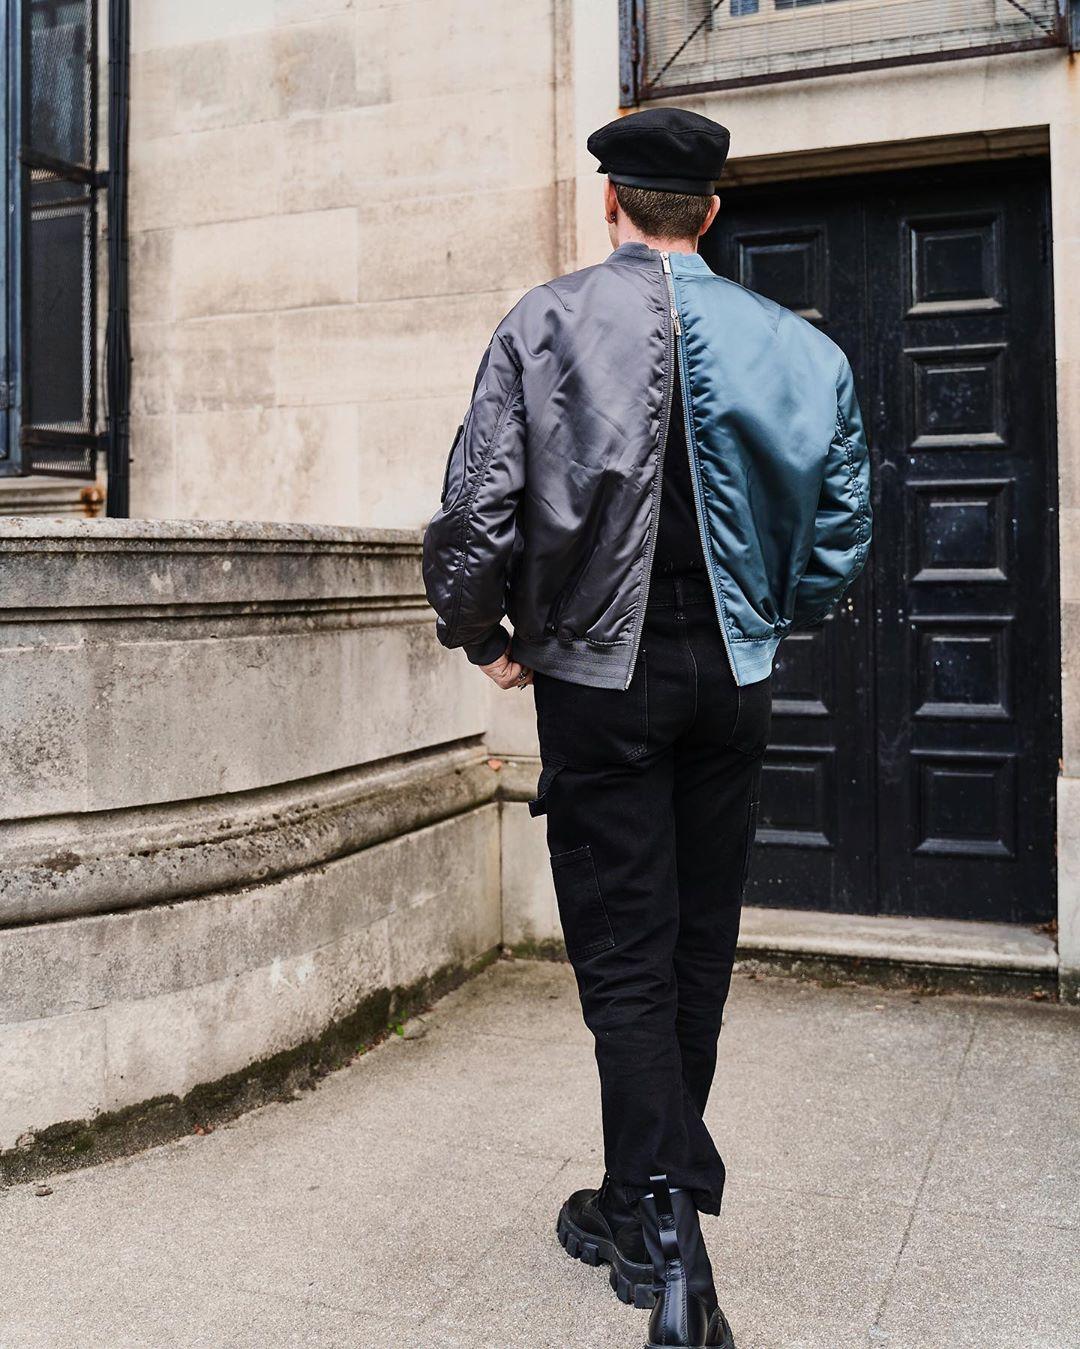 sao nam gallucks diện áo khoác dior phía sau